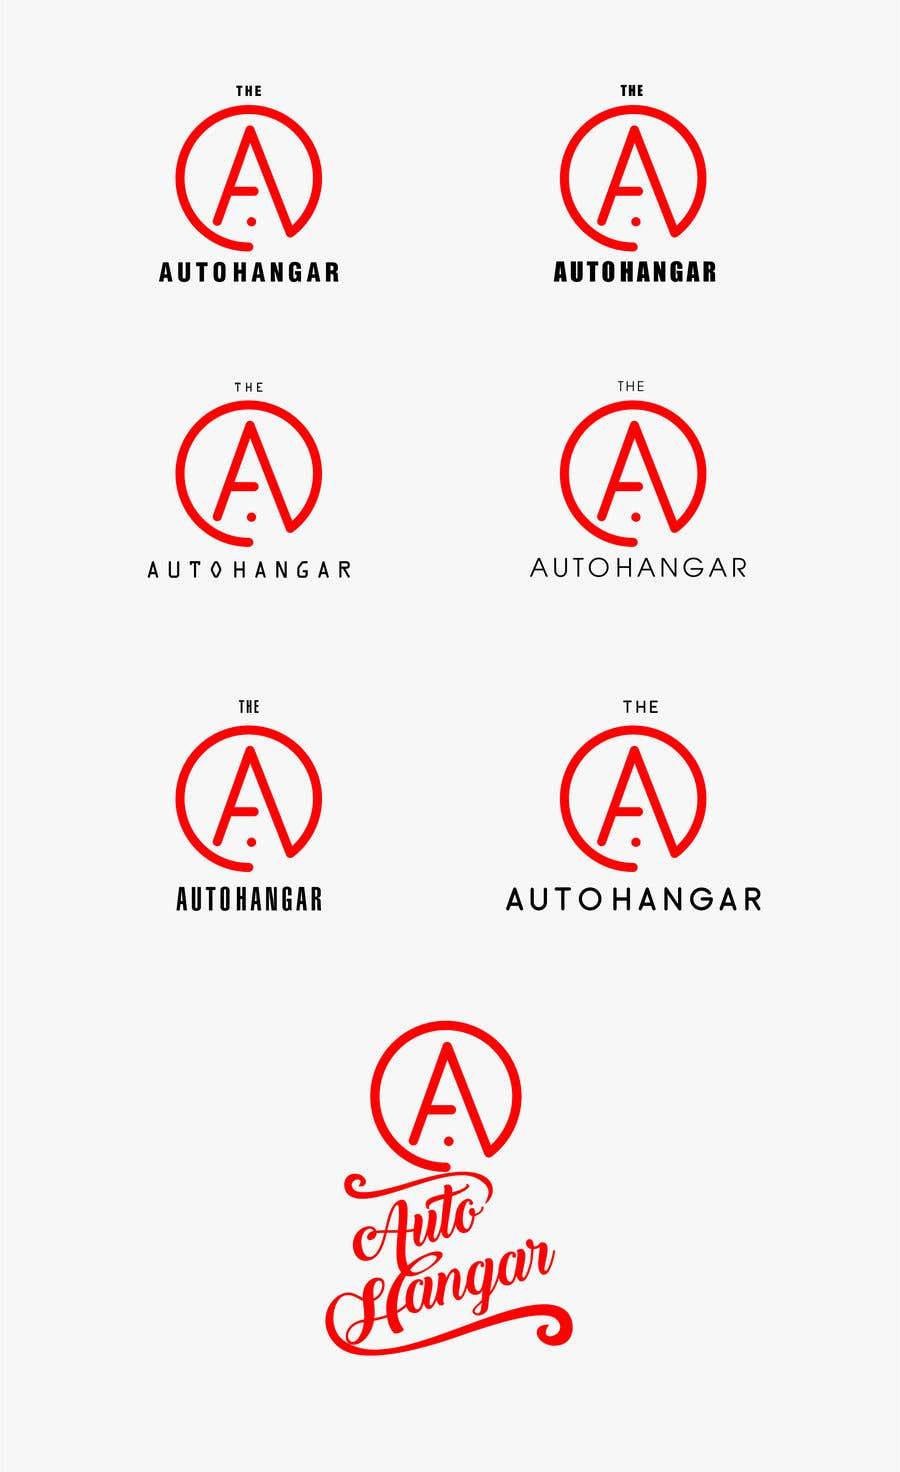 Penyertaan Peraduan #455 untuk Unique logo for an auto dealership in an airport hangar!